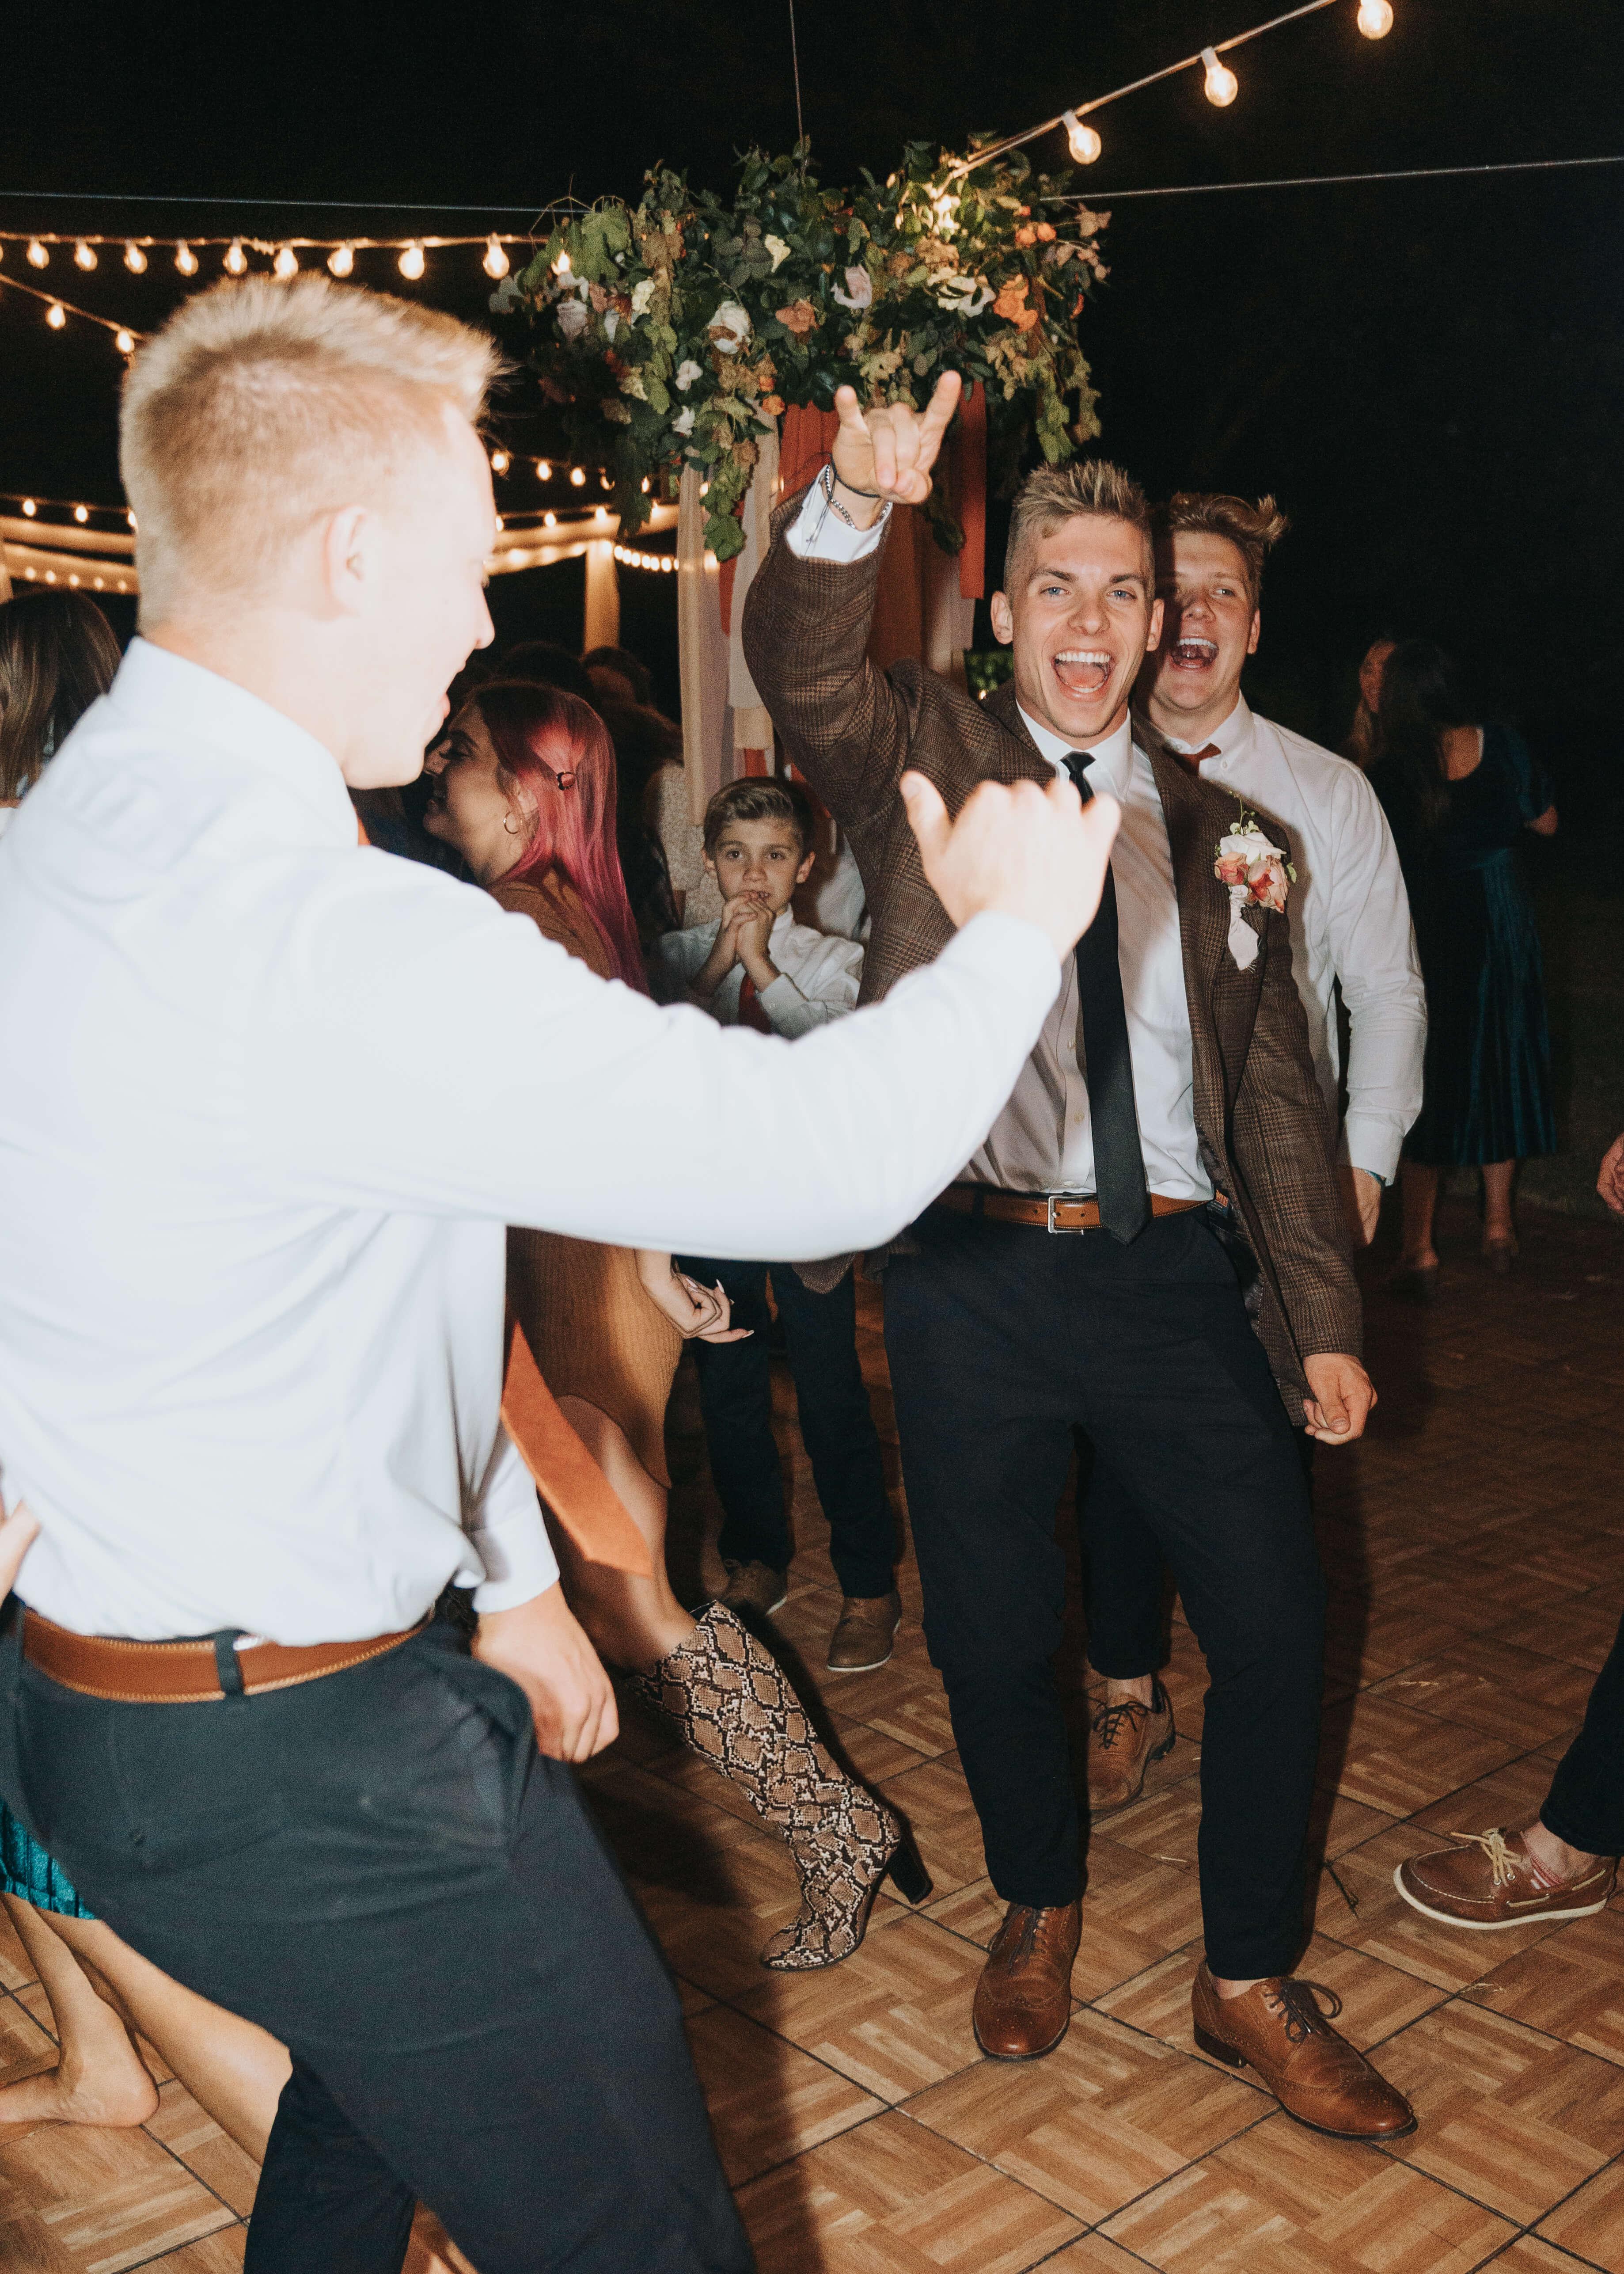 crazy dance photo